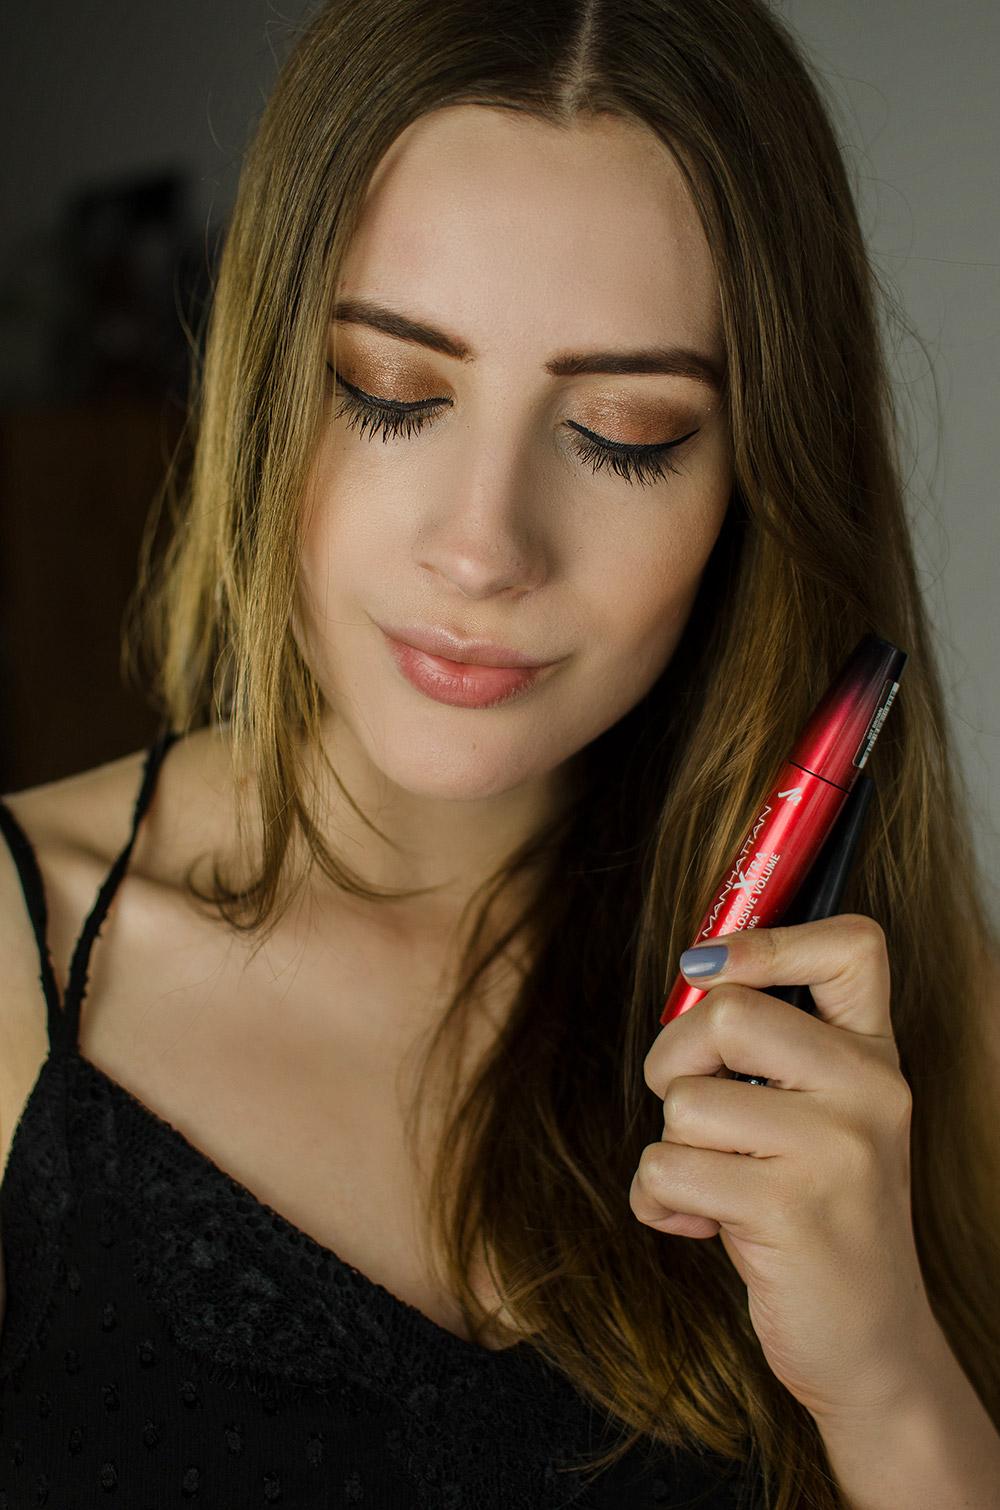 andysparkles-Beautyblog-Herbst Make-Up-Manhattan-Bloggerparade